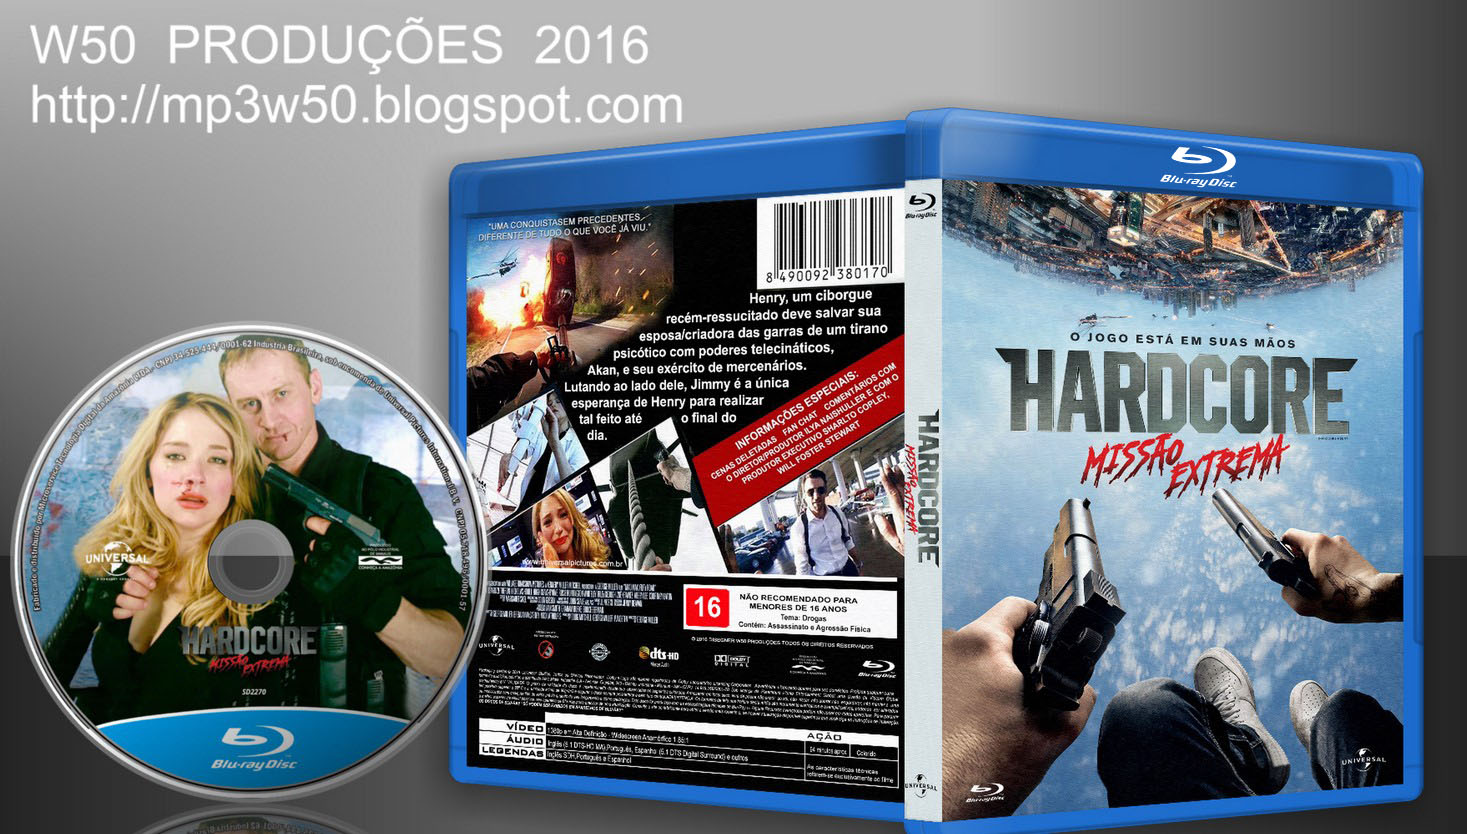 w50 produ es cds dvds blu ray hardcore miss o extrema blu ray lan amento 2016. Black Bedroom Furniture Sets. Home Design Ideas